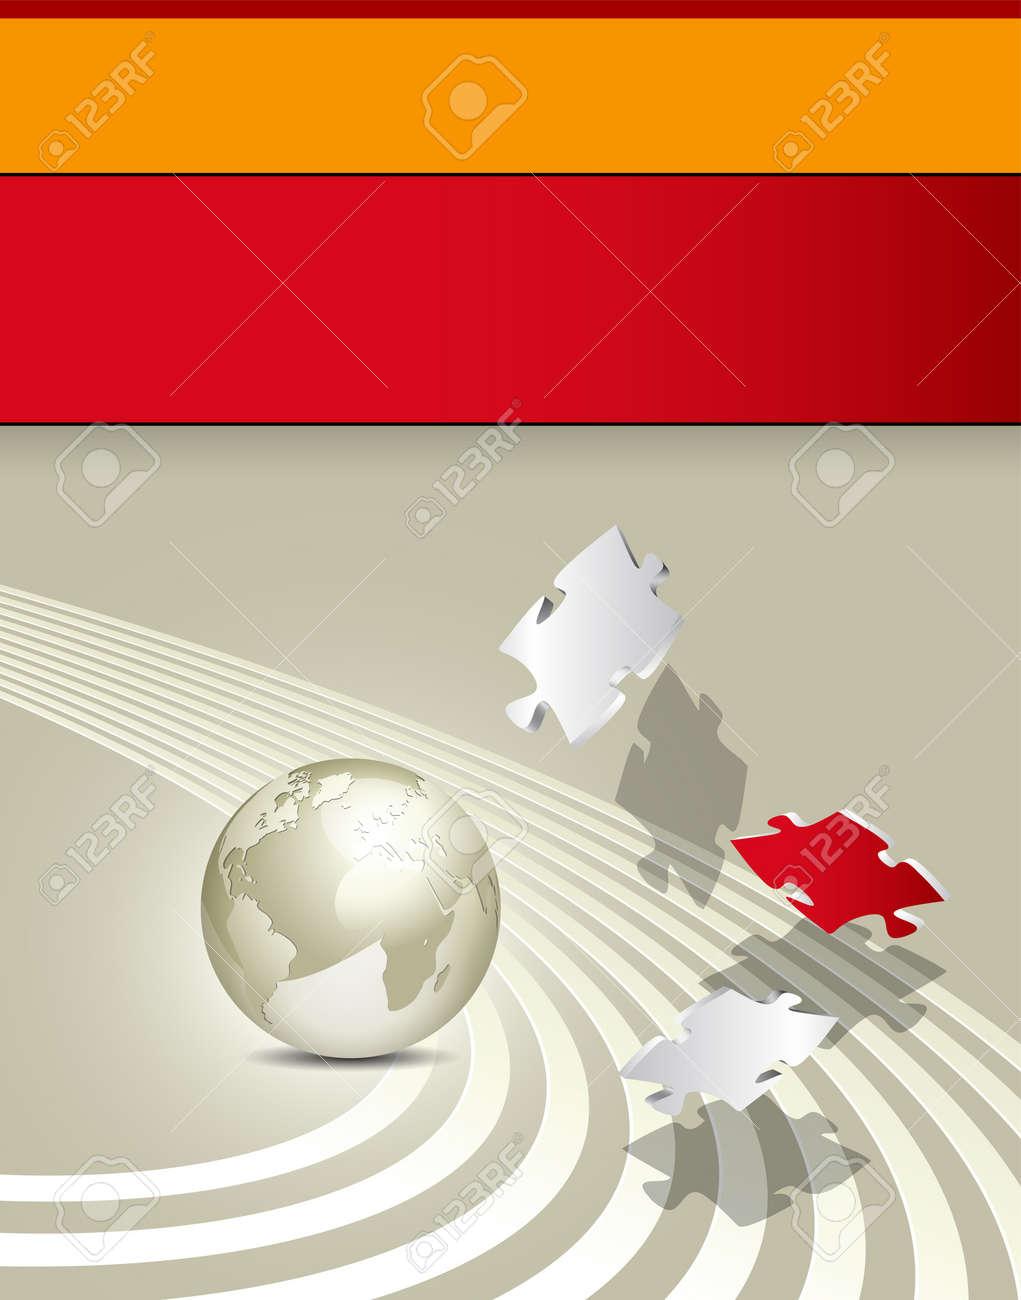 Business brochure - corporate background design - advertising template Stock Vector - 12494019